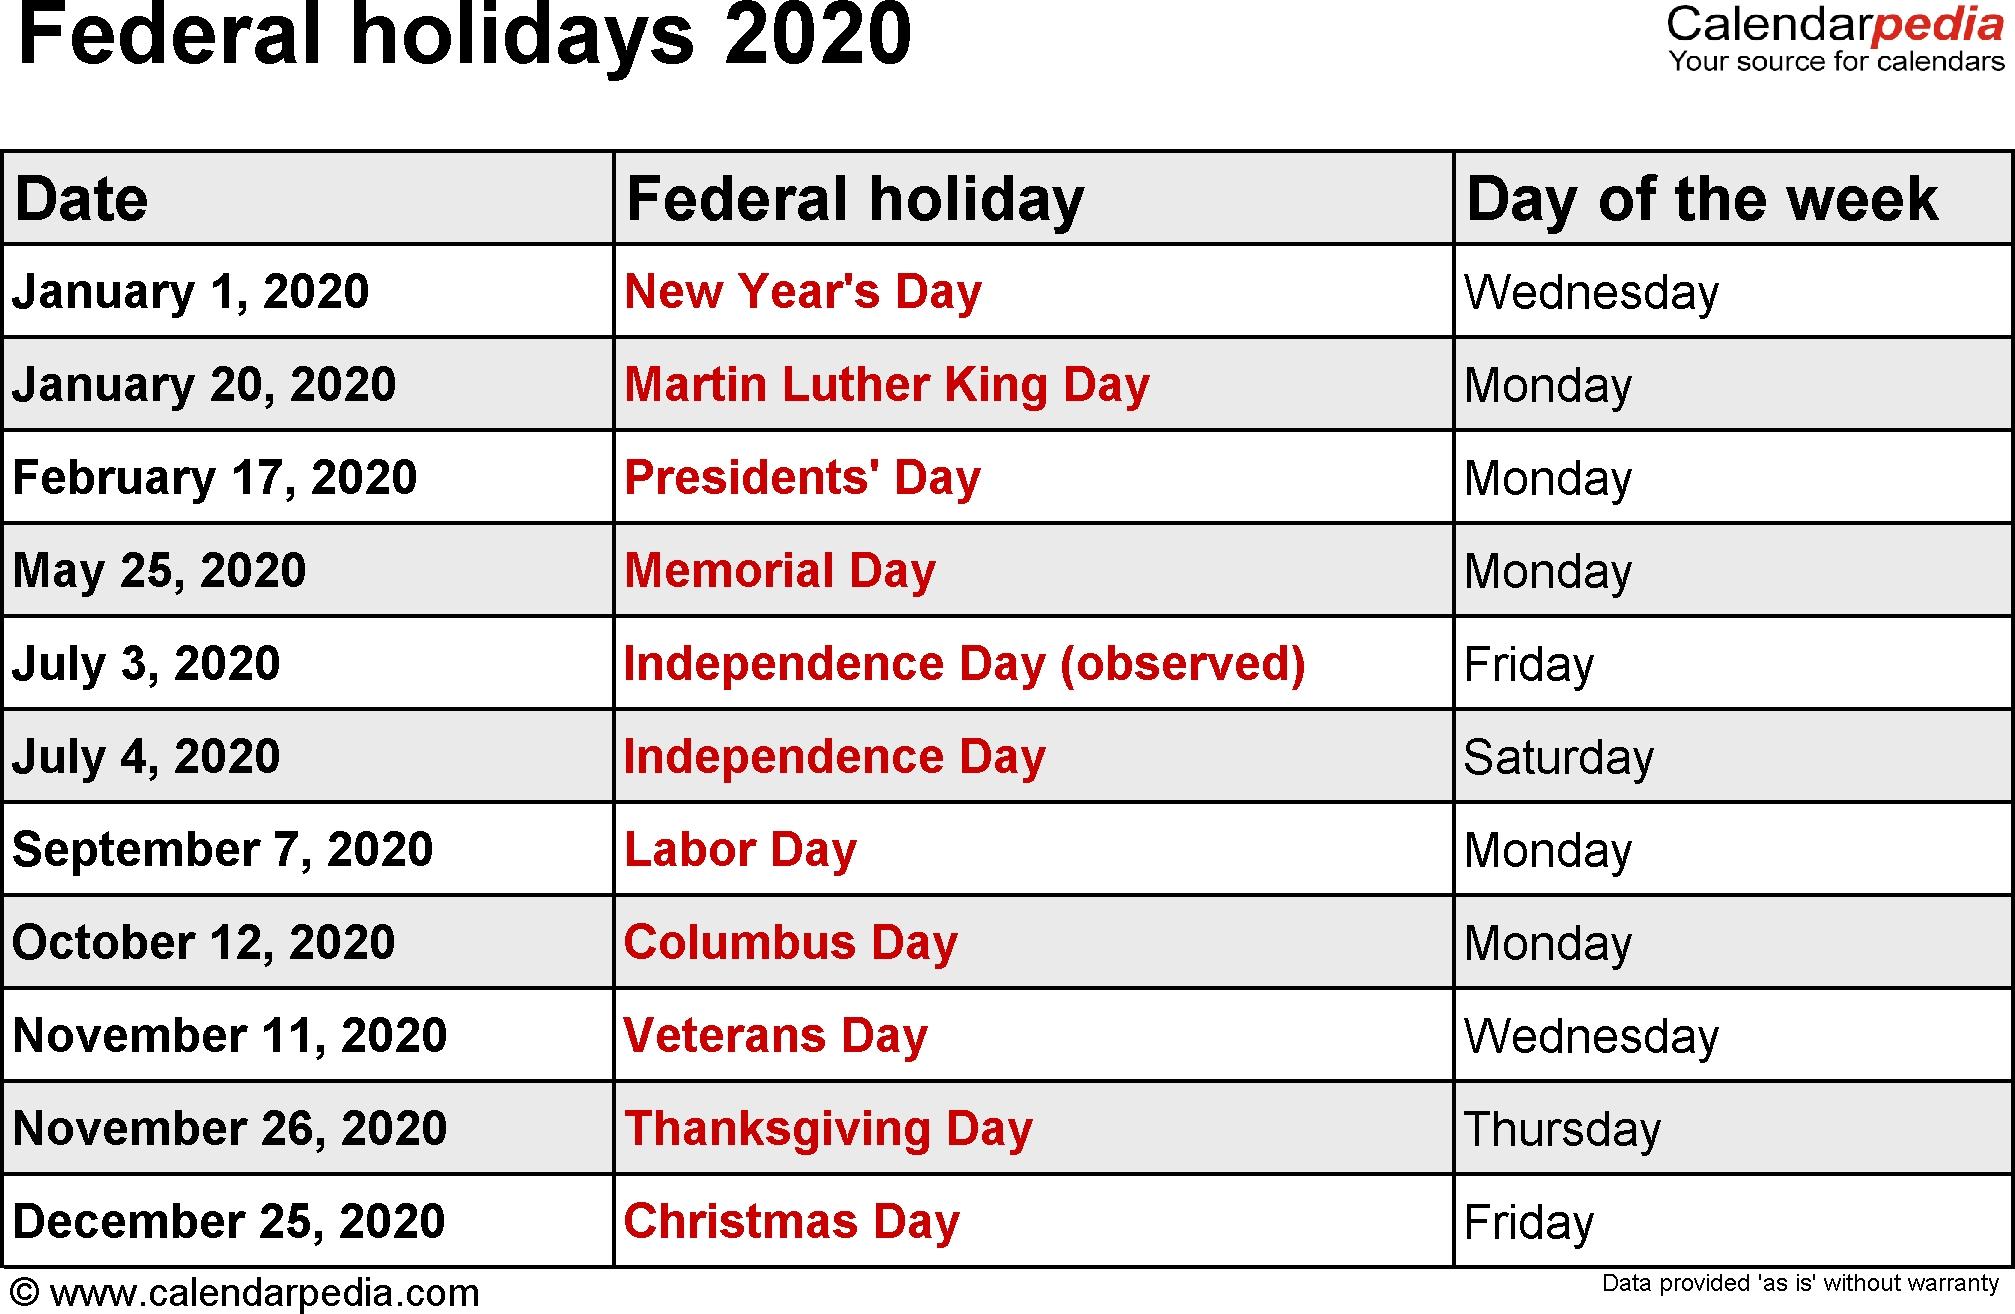 Federal Holidays 2020-Calendar For 2020 Indicating Public Holidays